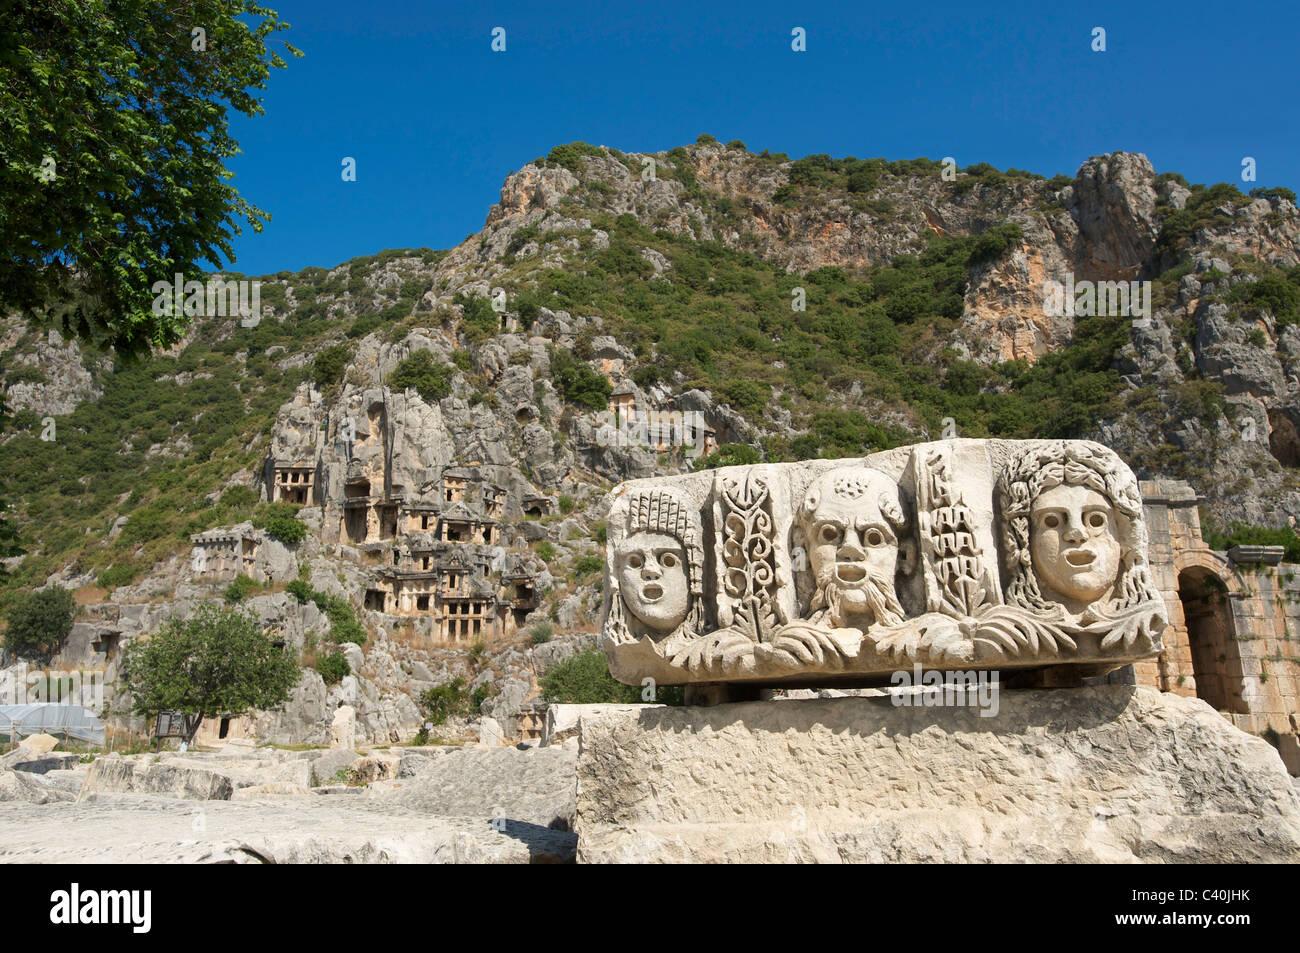 Turkish, Riviera, Lycia, cliff graves, theatrical masks, Myra, Lycia, south coast, Turkey, culture - Stock Image